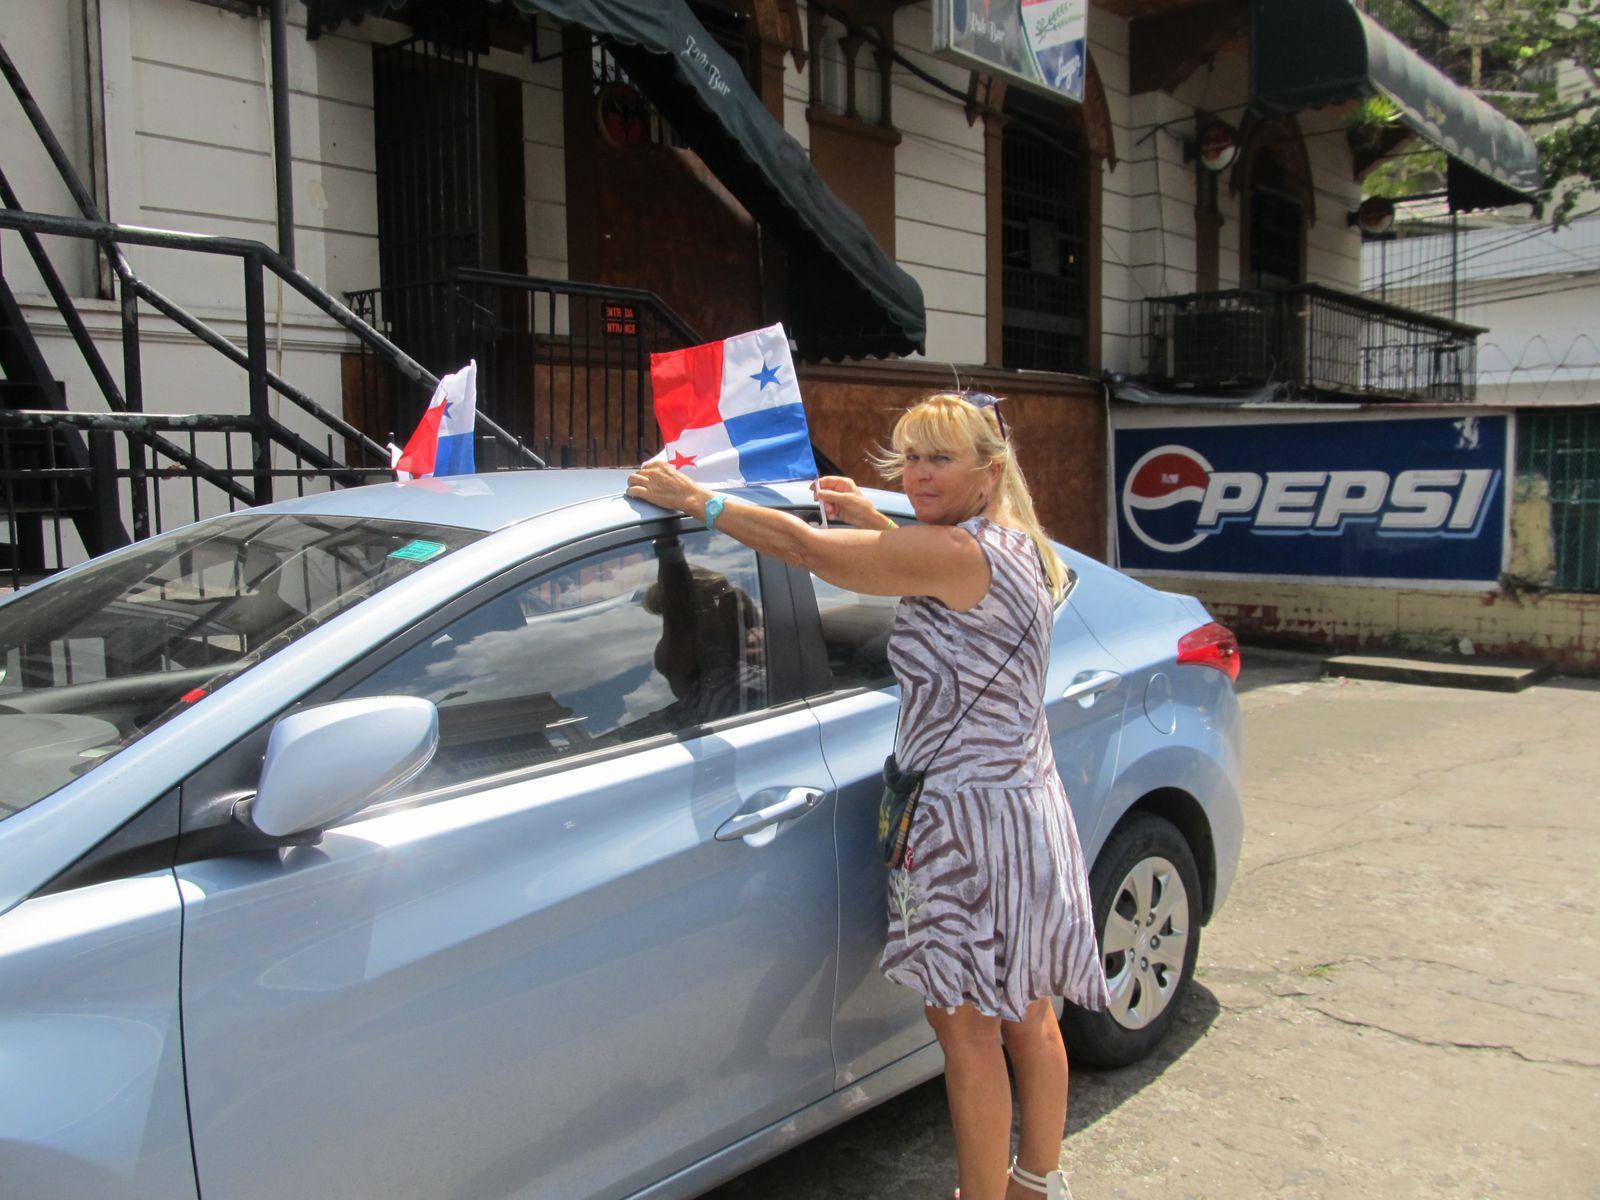 CAR   COLORE´S  + PANAMA  CITY  + FIESTA  A  EL  VALLES